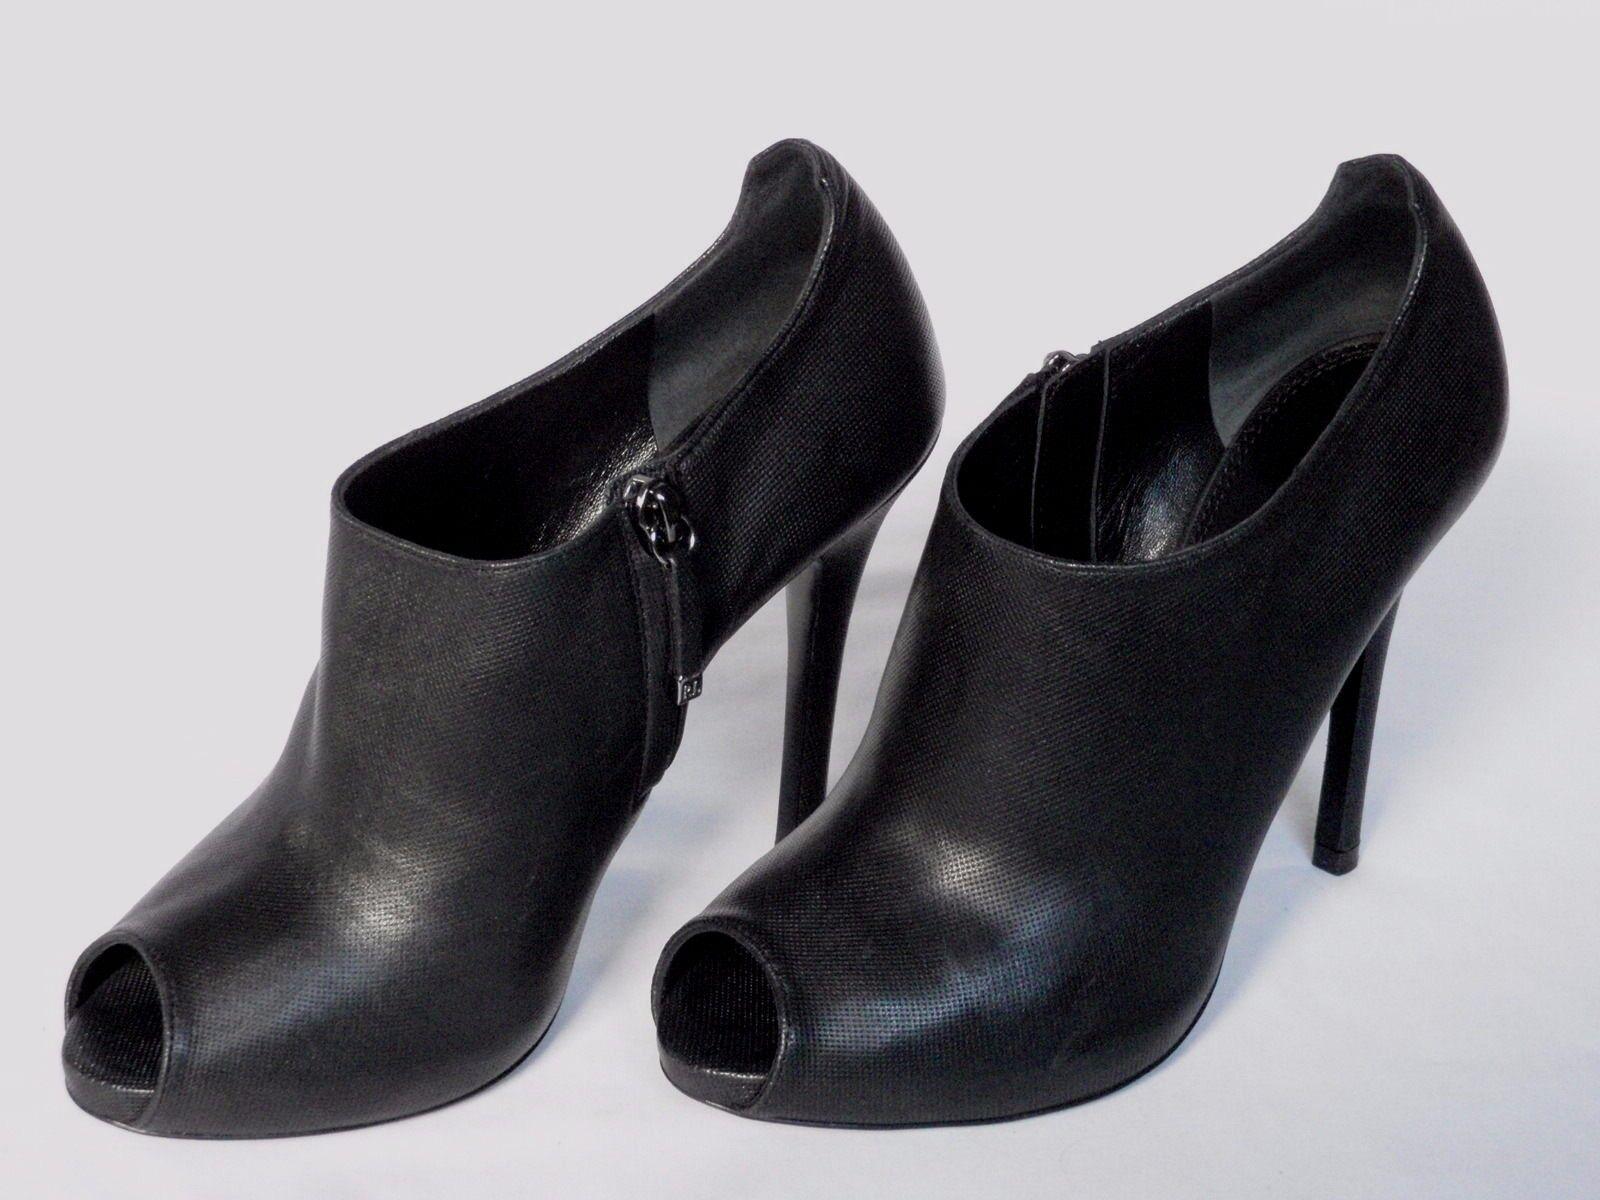 Nuevas damas Jassie Ralph Lauren De Cuero Negro Zapato Zapato Zapato Bota UK 7 EU 39.5 nos 9.5  moda